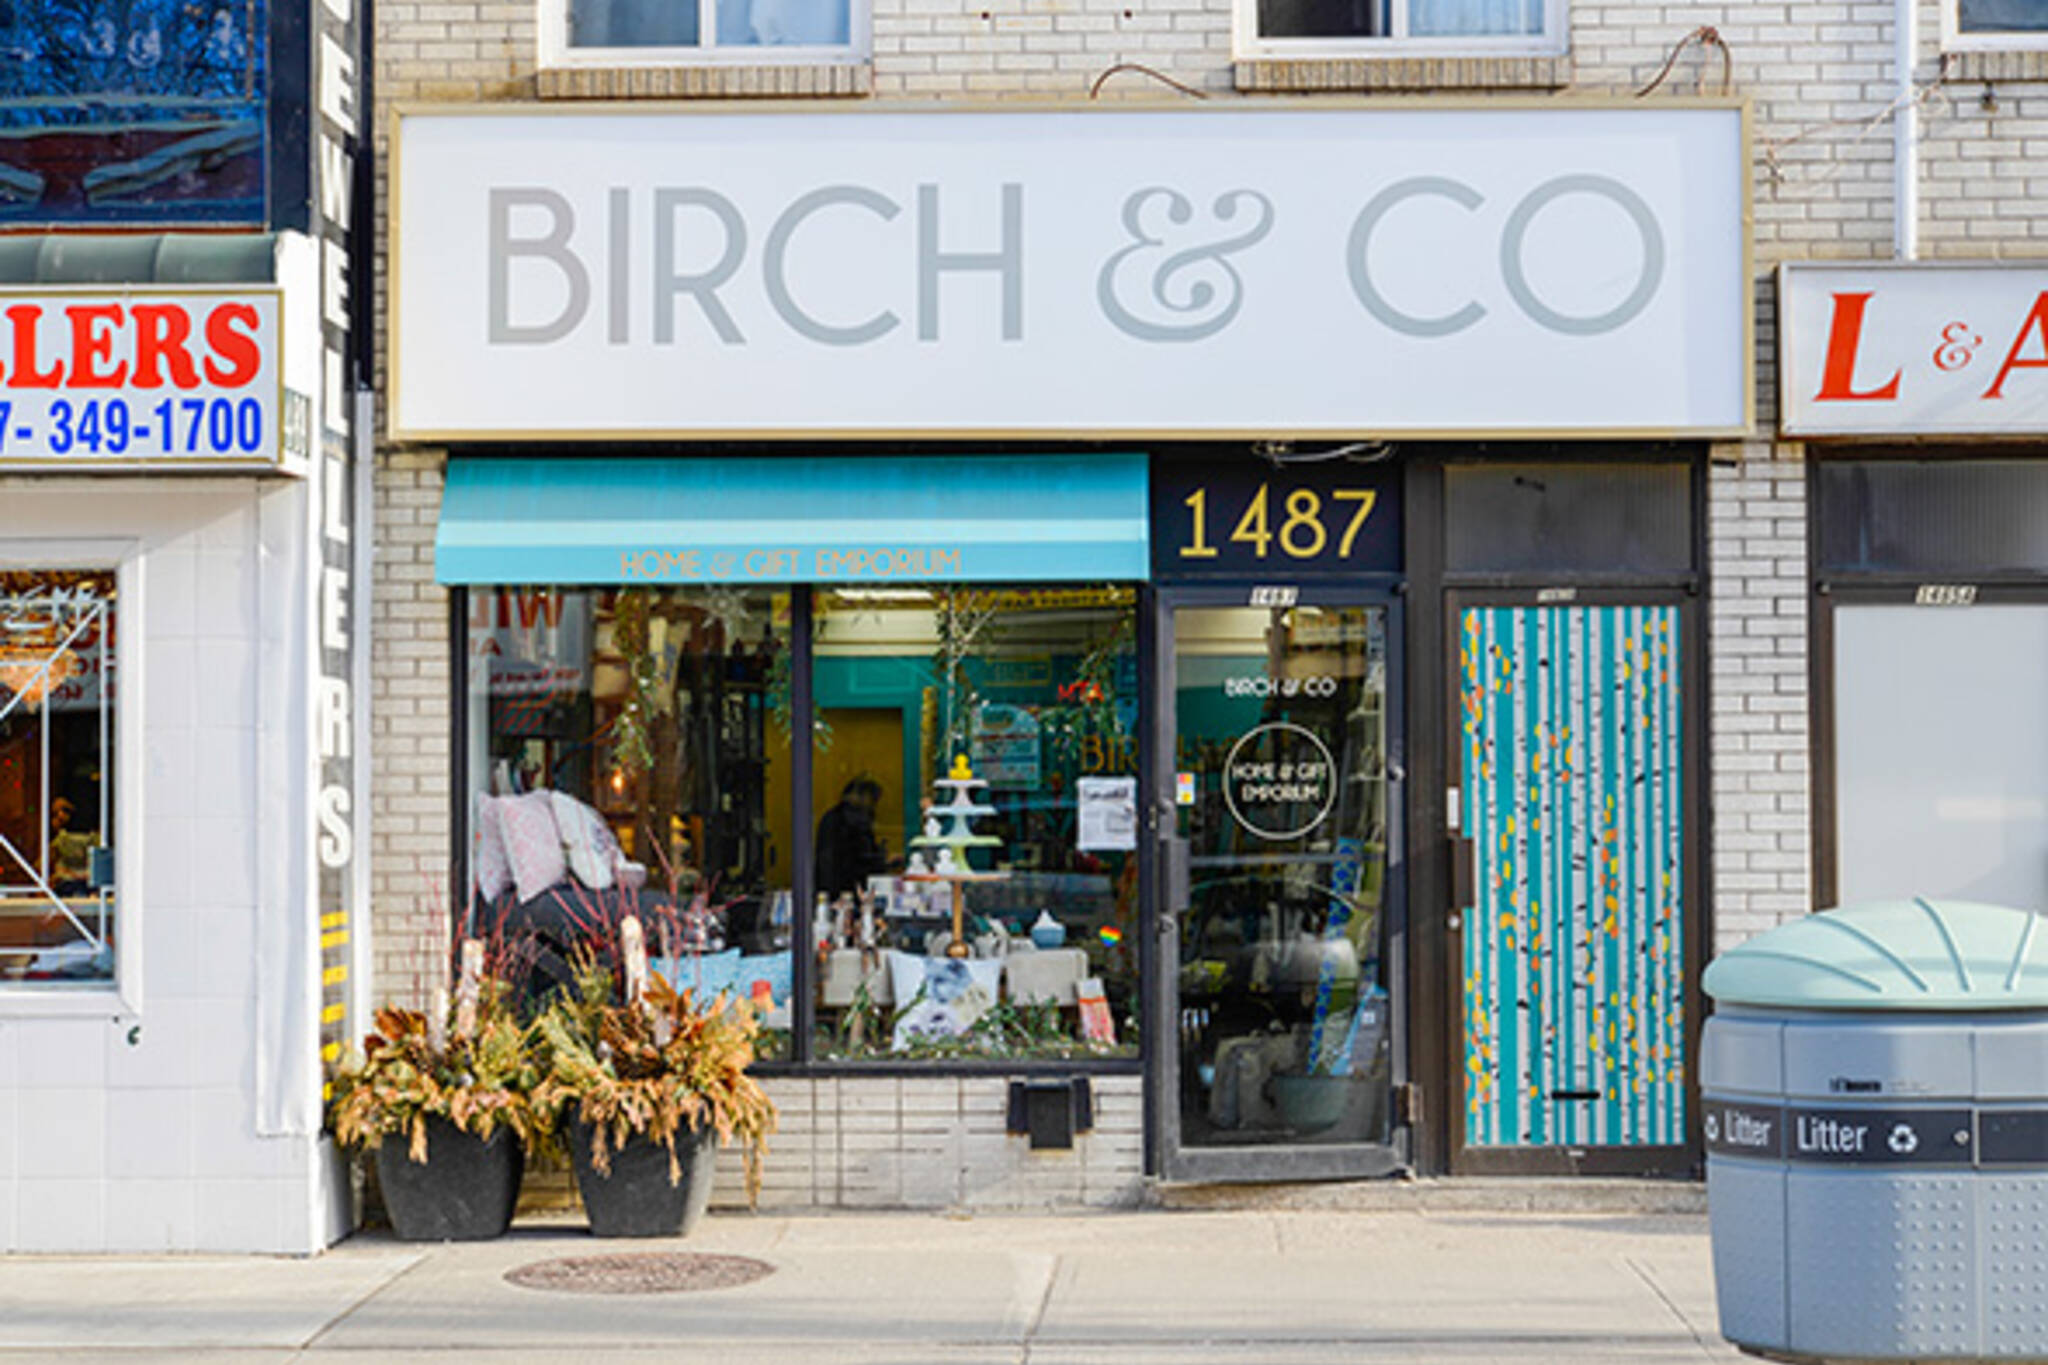 Birch & Co.